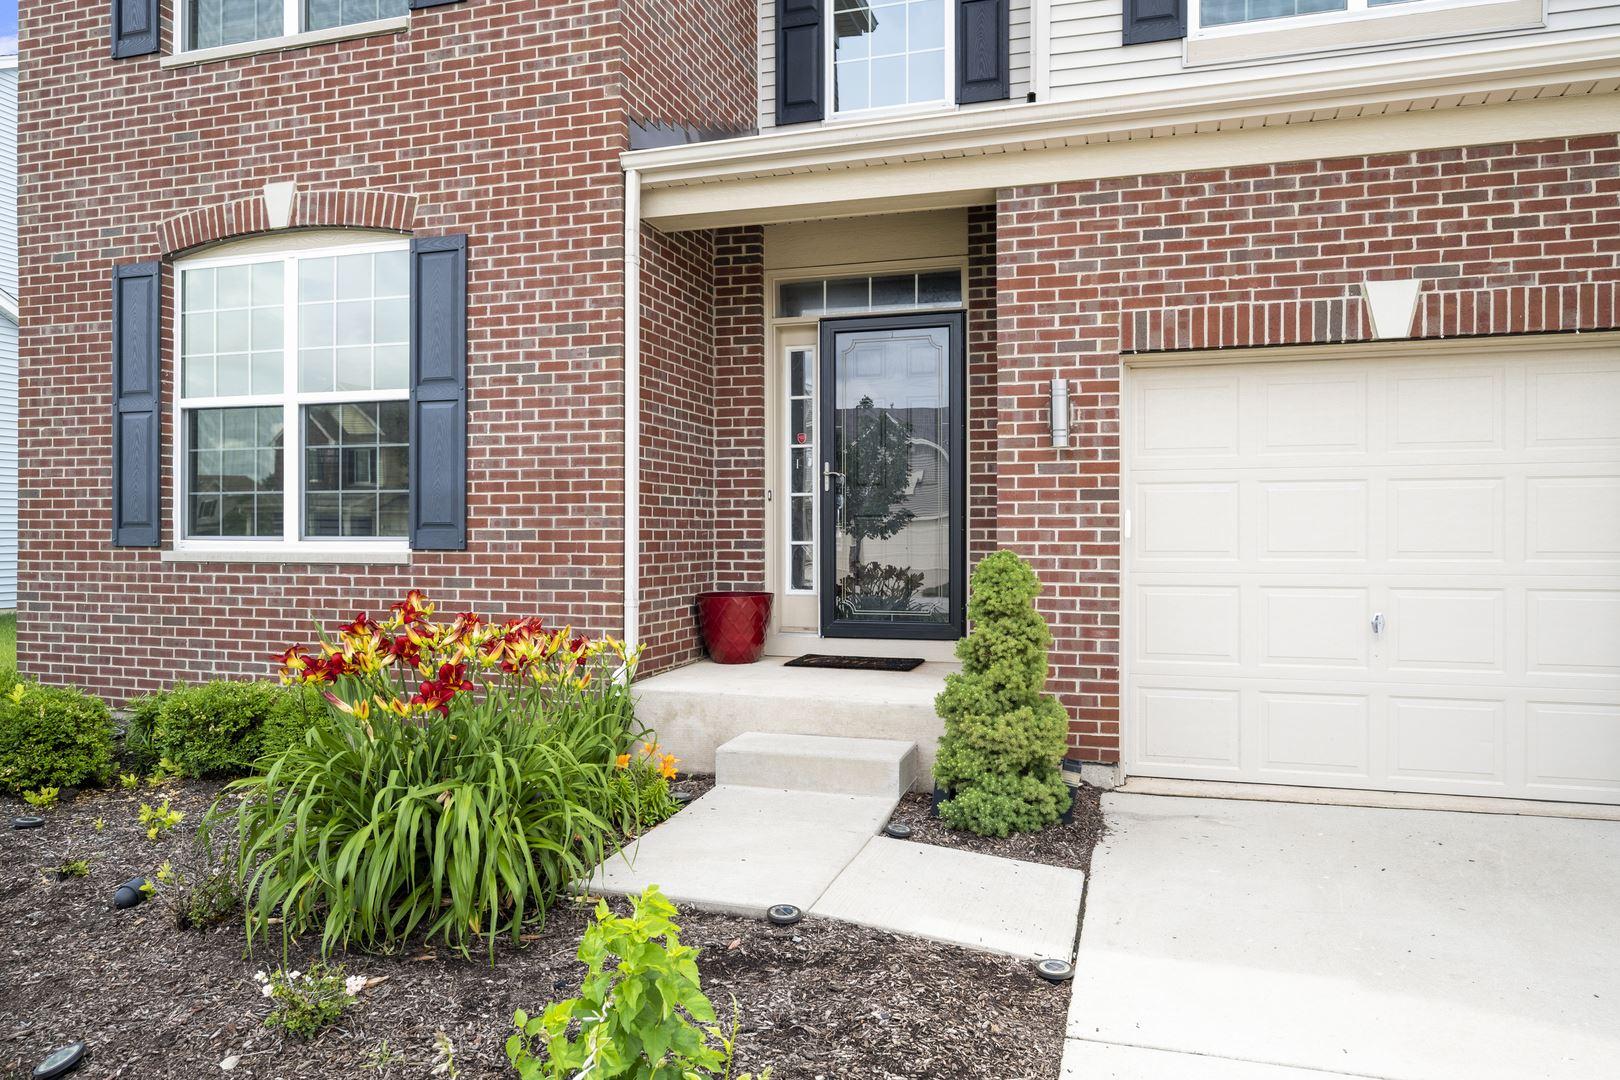 Photo of 521 Northgate Lane, Shorewood, IL 60404 (MLS # 11142923)